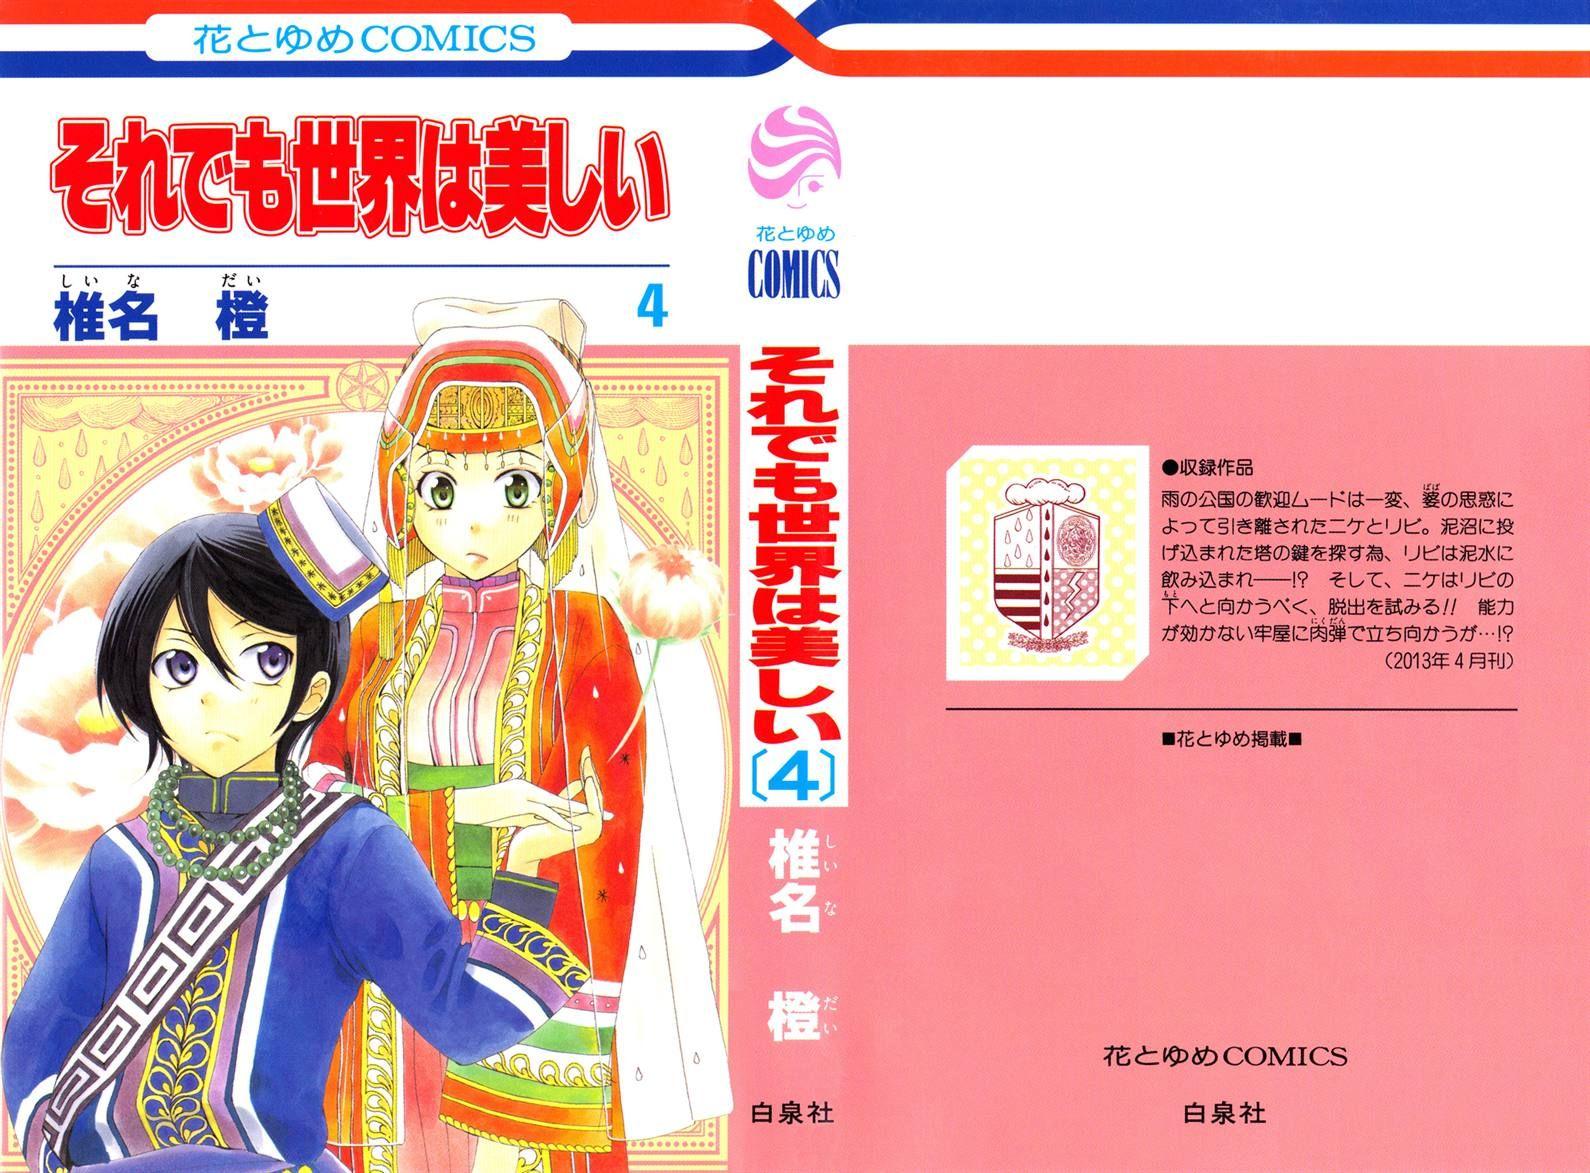 Soredemo Sekai wa Utsukushii 15 Page 1